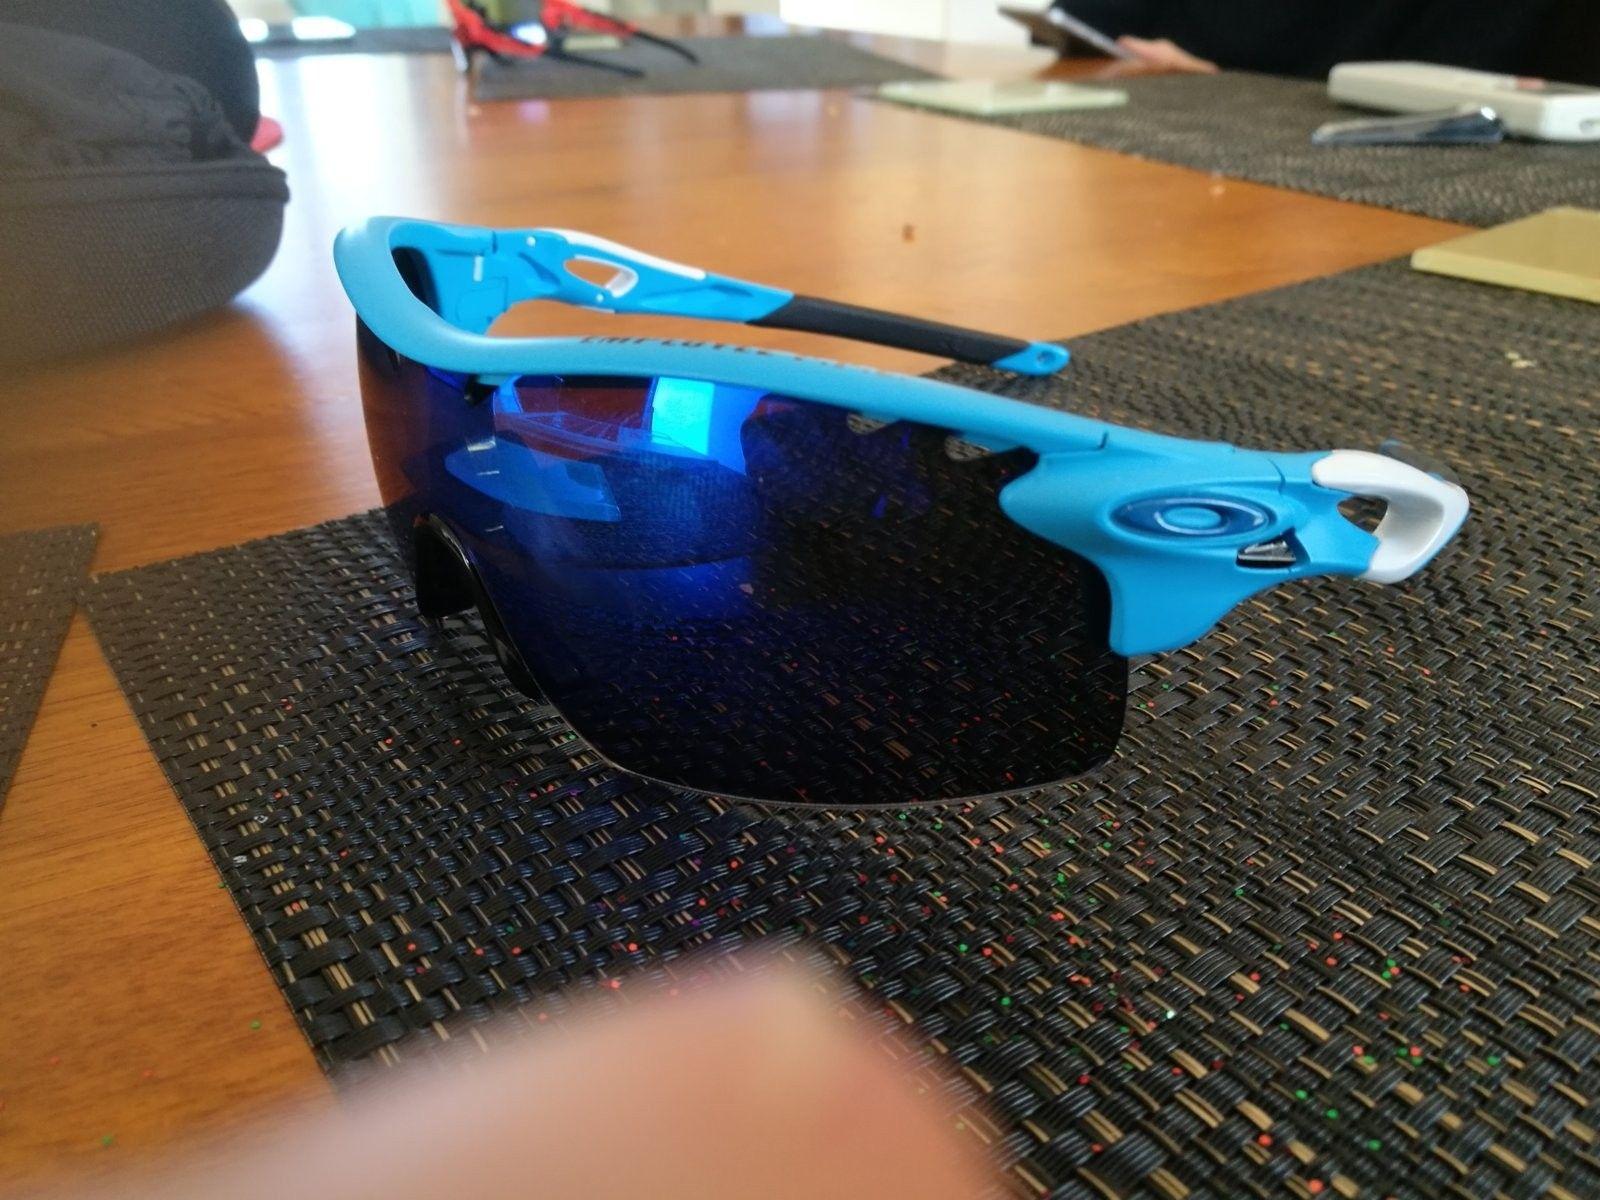 Radarlock XL Glacier blue help!: Not sure if Authentic or not - IMG_20160720_141456.jpg